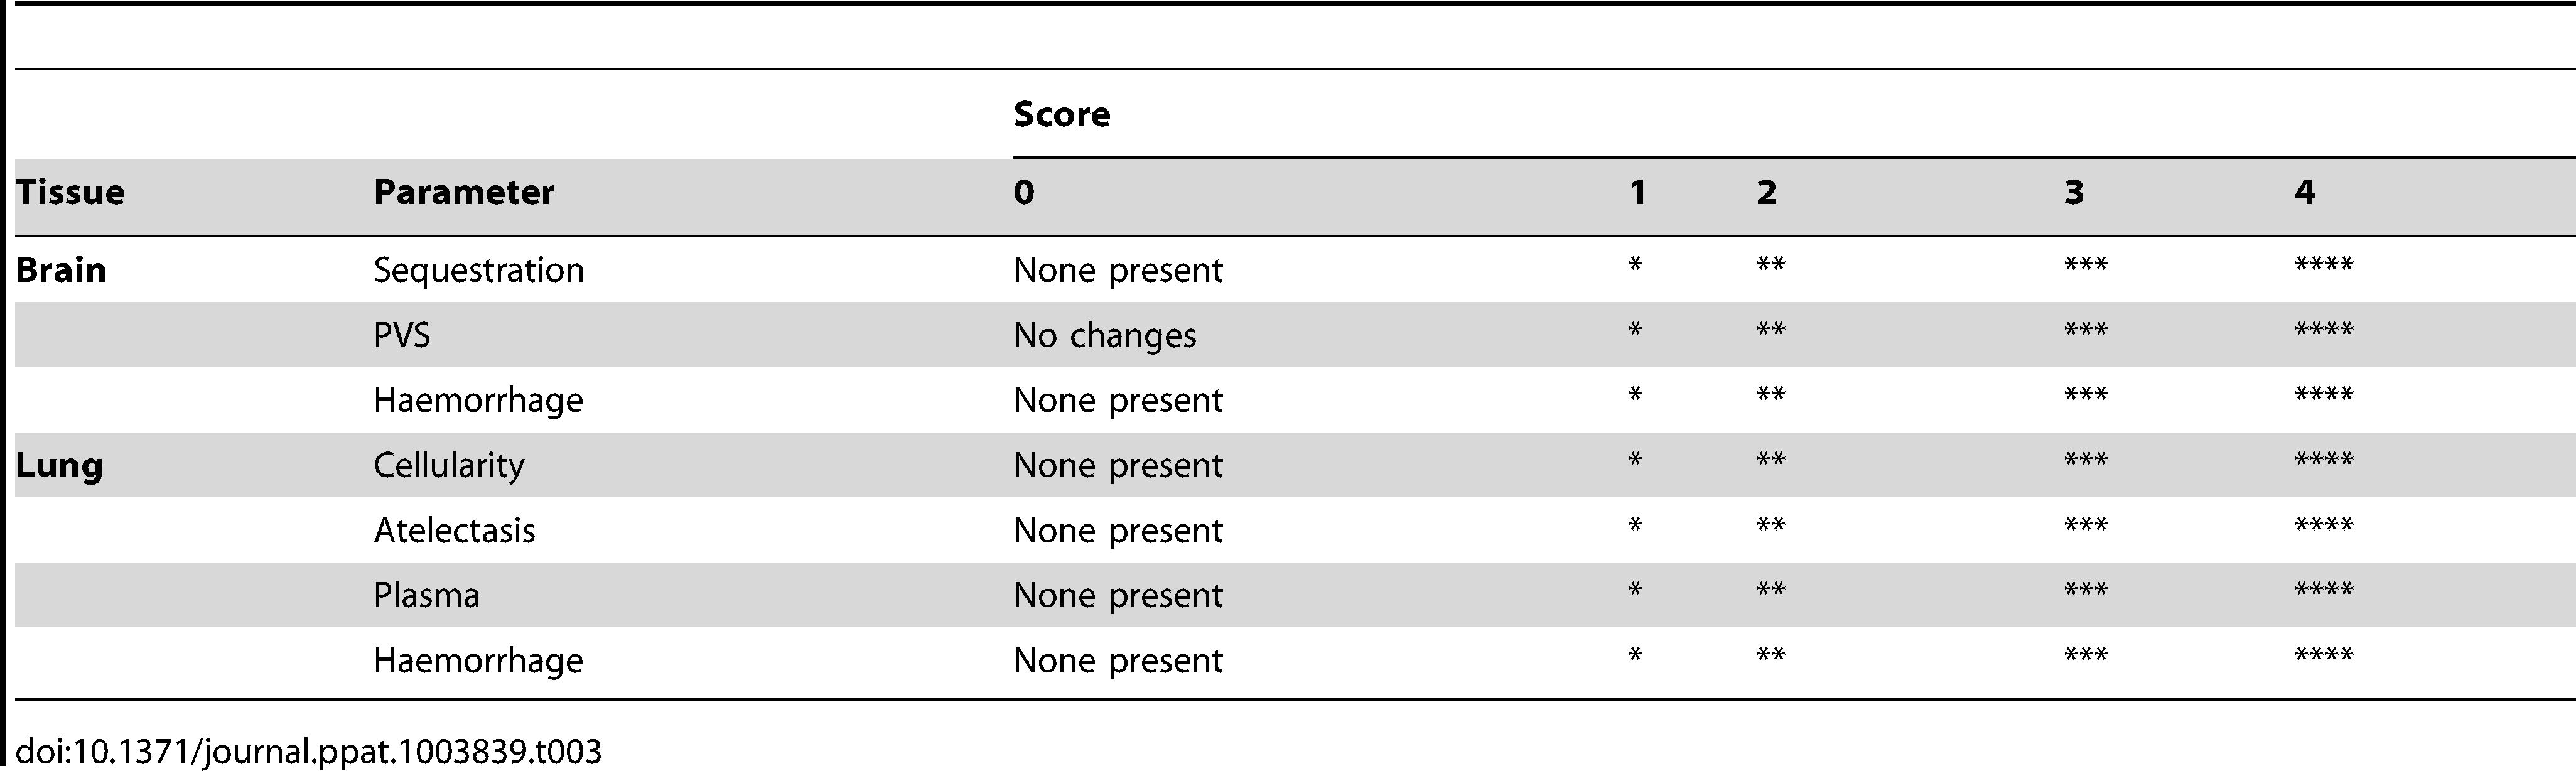 The qualitative histopathological scoring of the tissue.